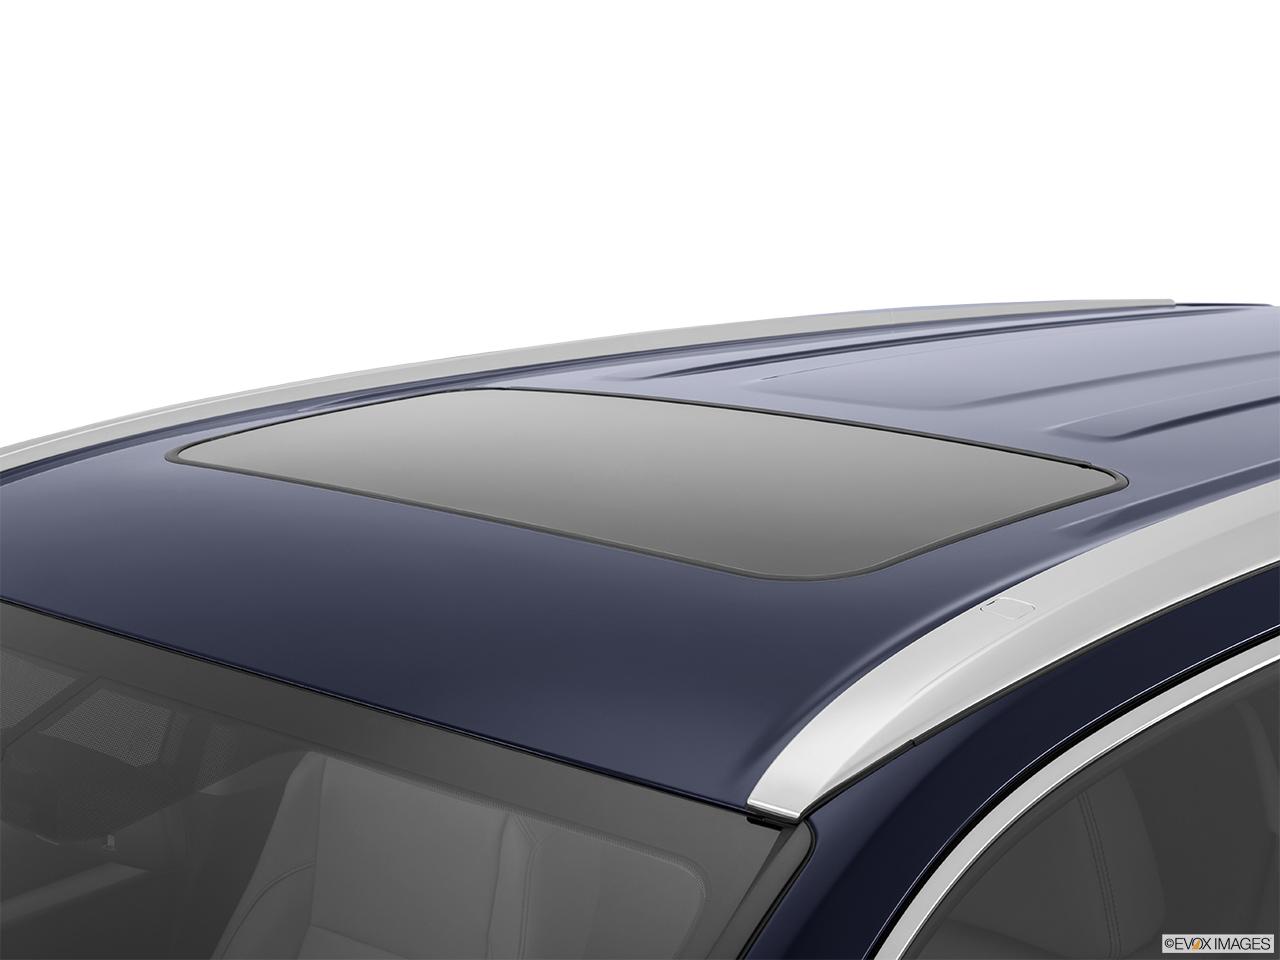 2015 Toyota Highlander Awd 4 Door V6 Xle Sunroof Moonroof